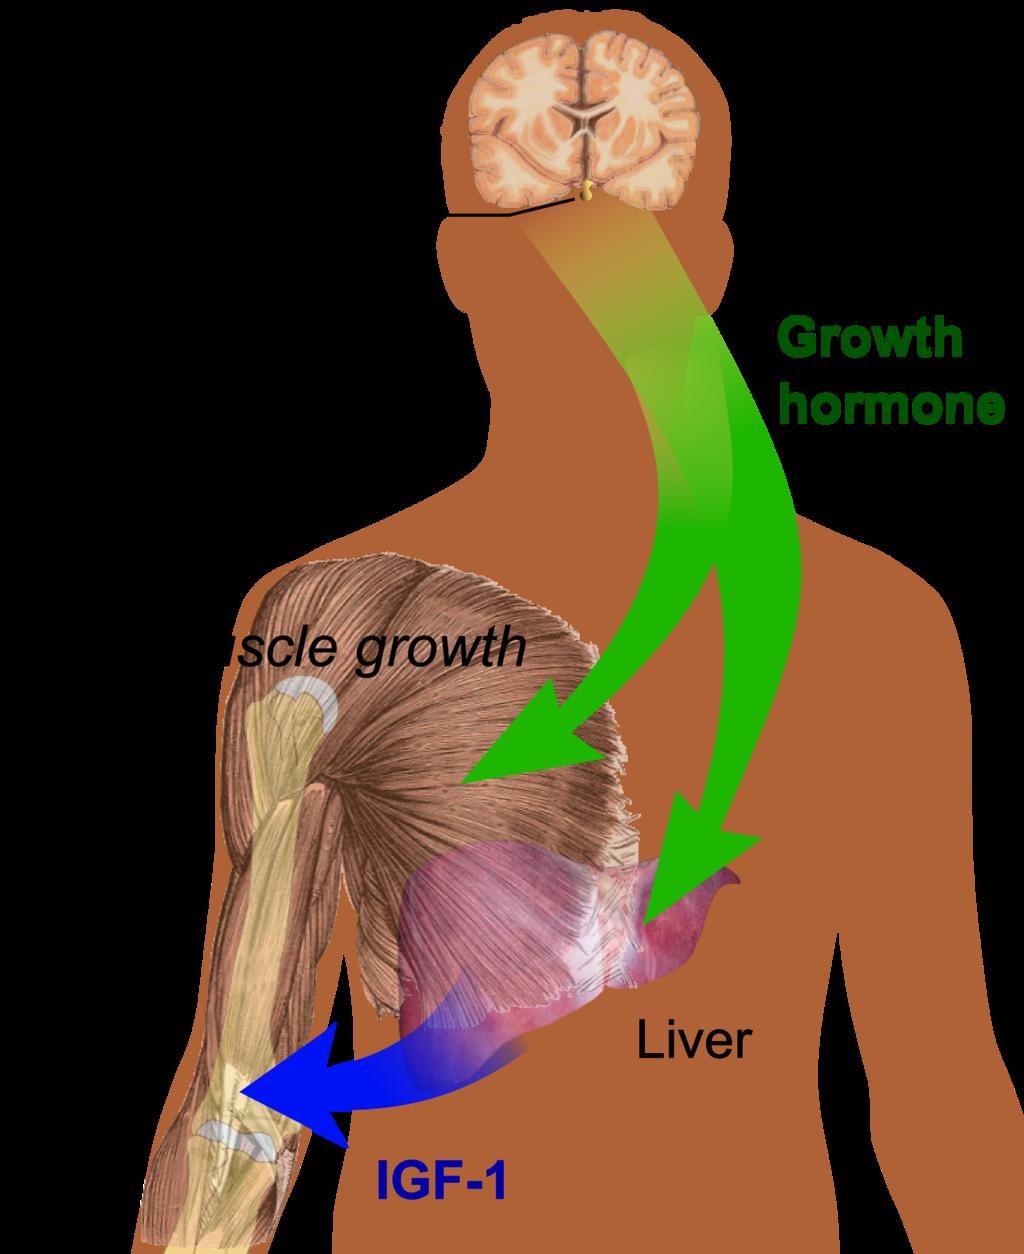 1024px-Endocrine_growth_regulation.png